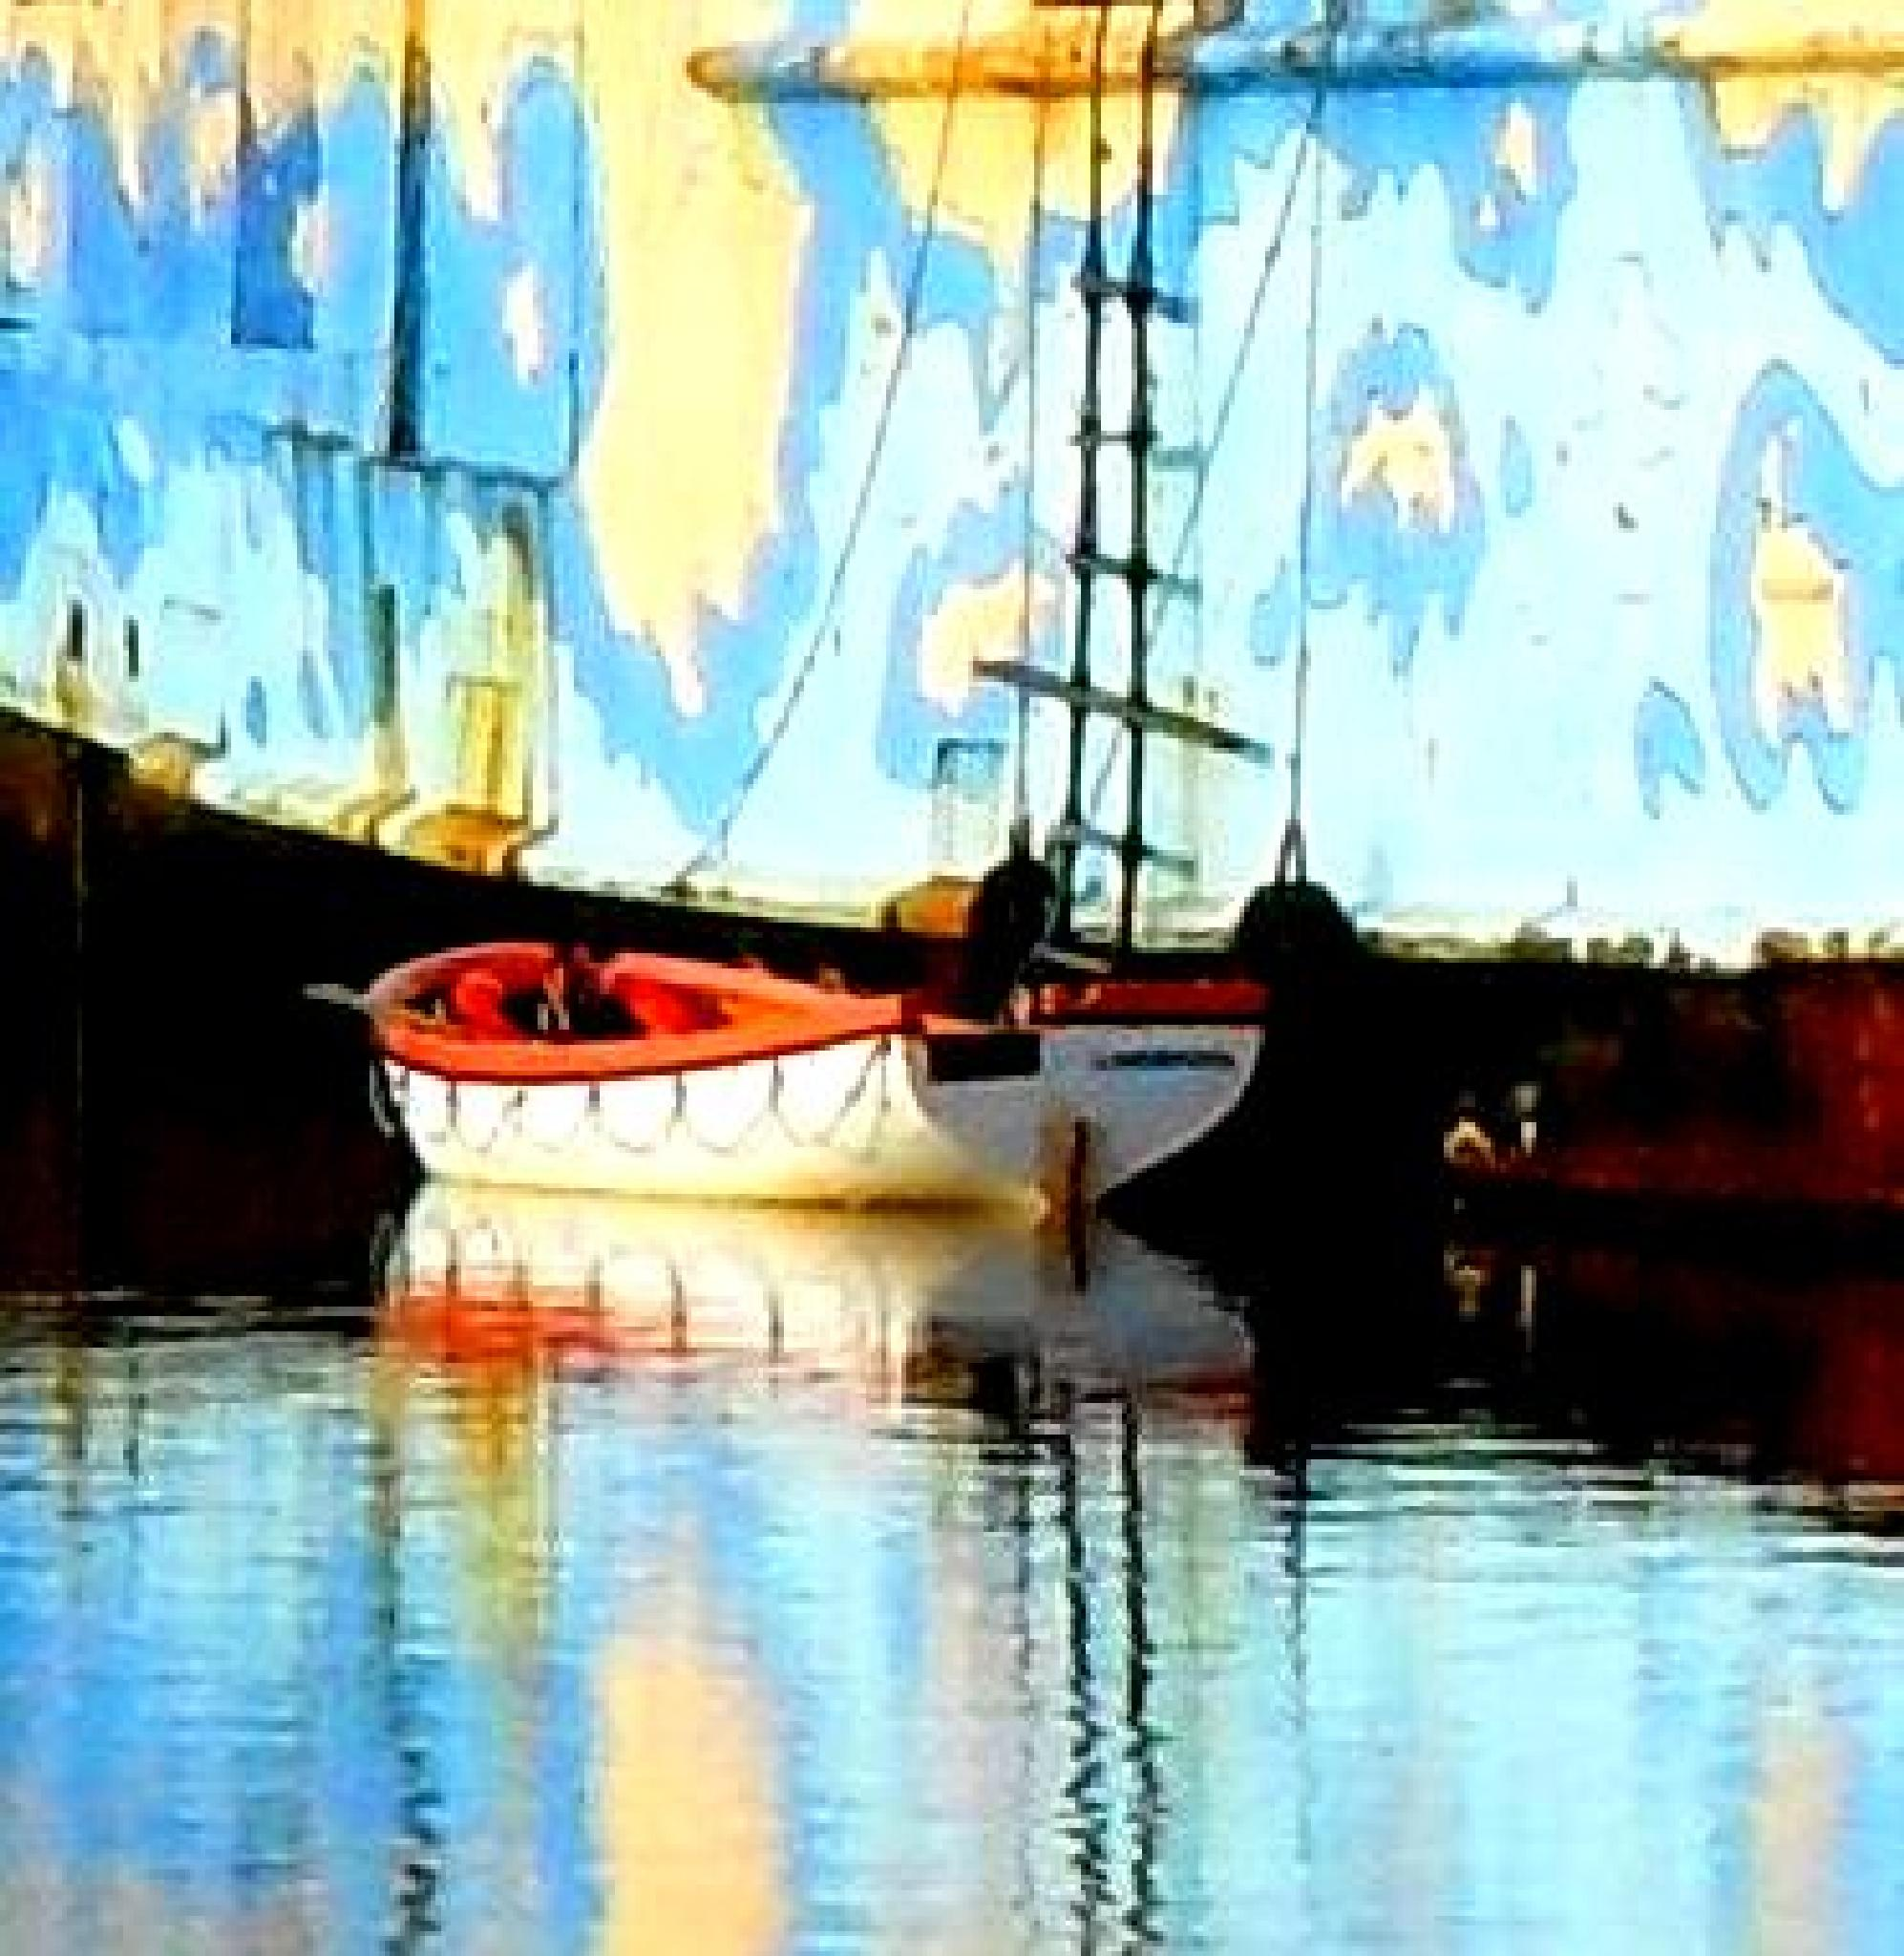 Old boat by Odard